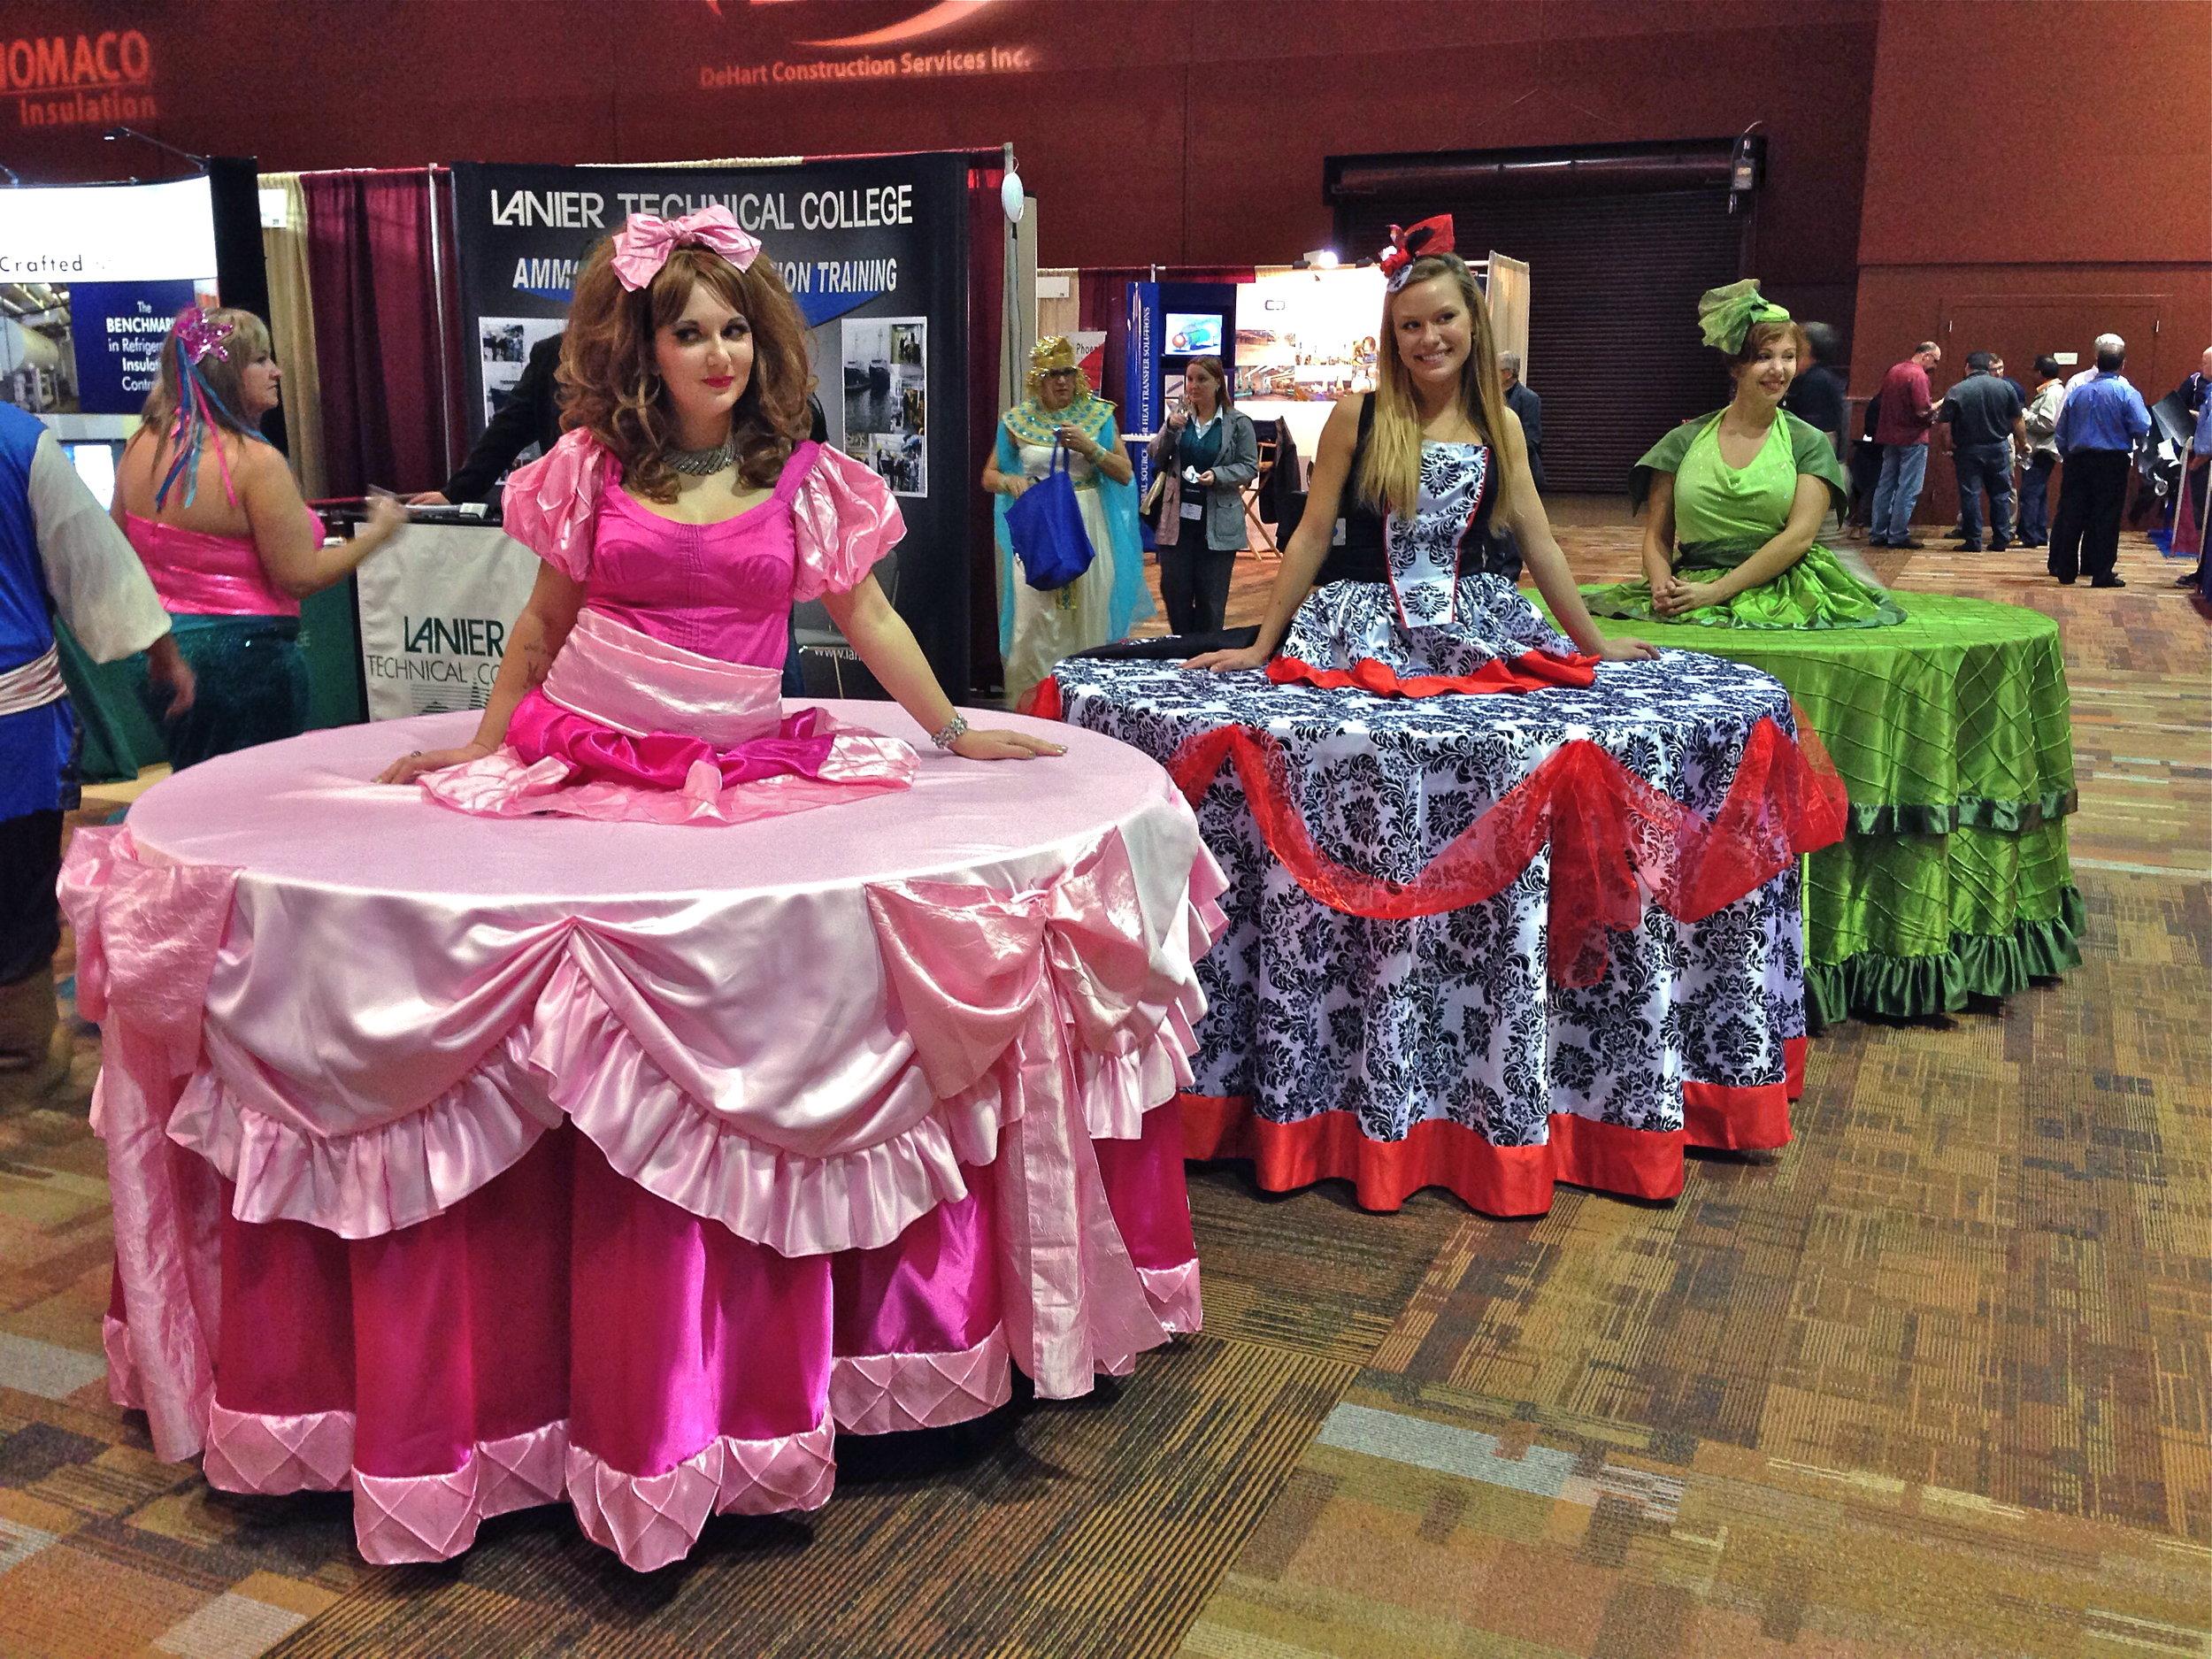 RETA Convention, Bellevue WA, 2013